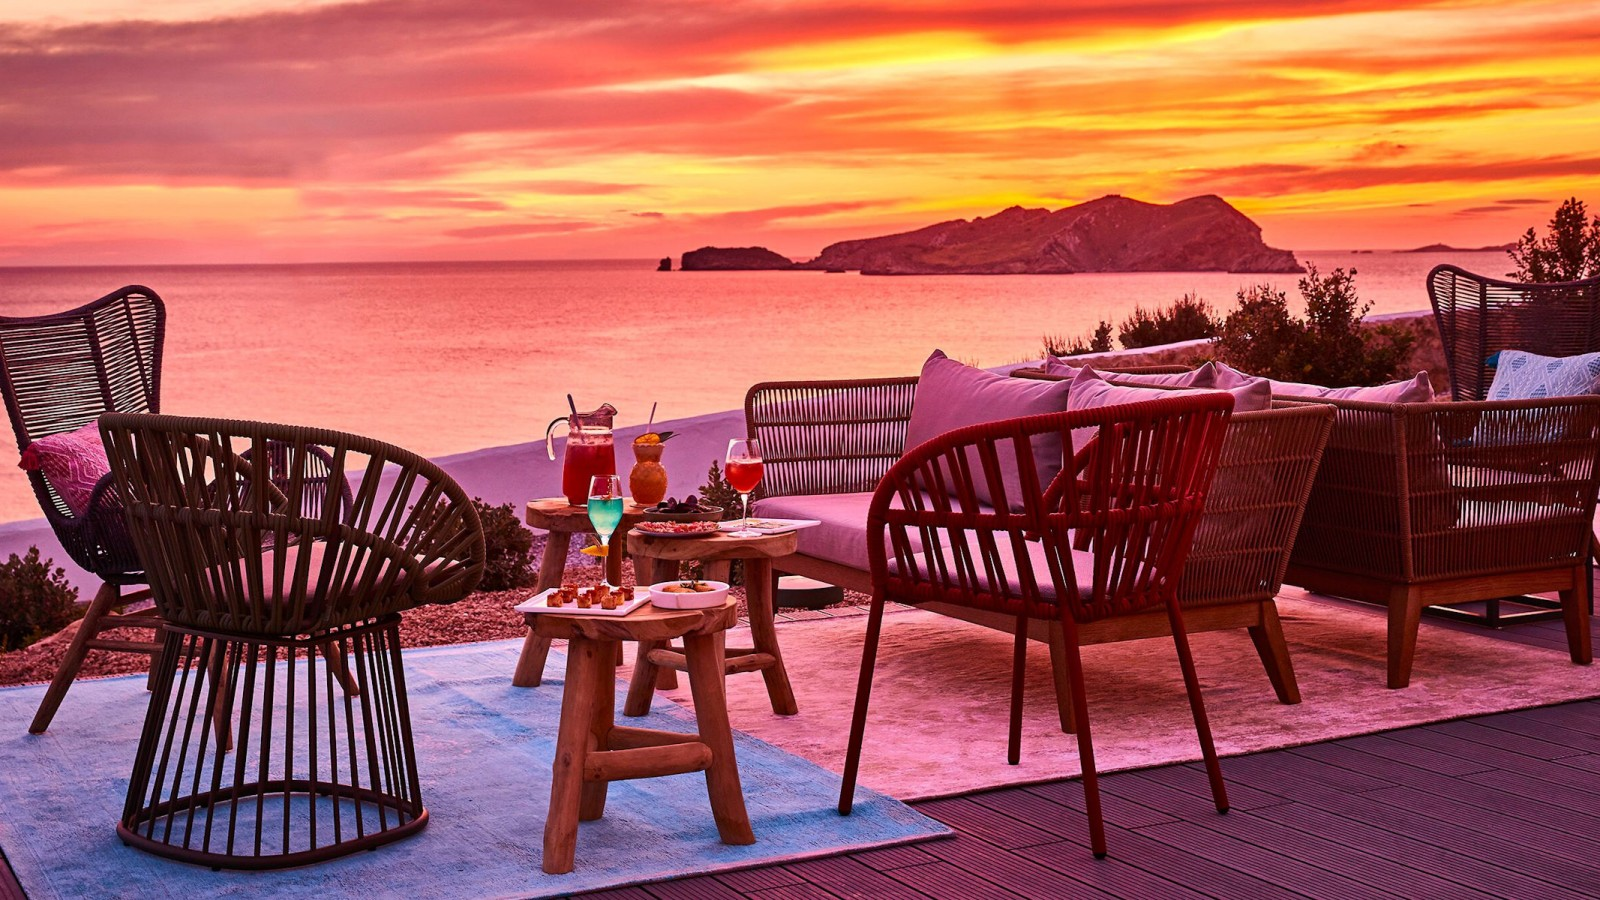 Cone Club Sunset 7Pines Ibiza